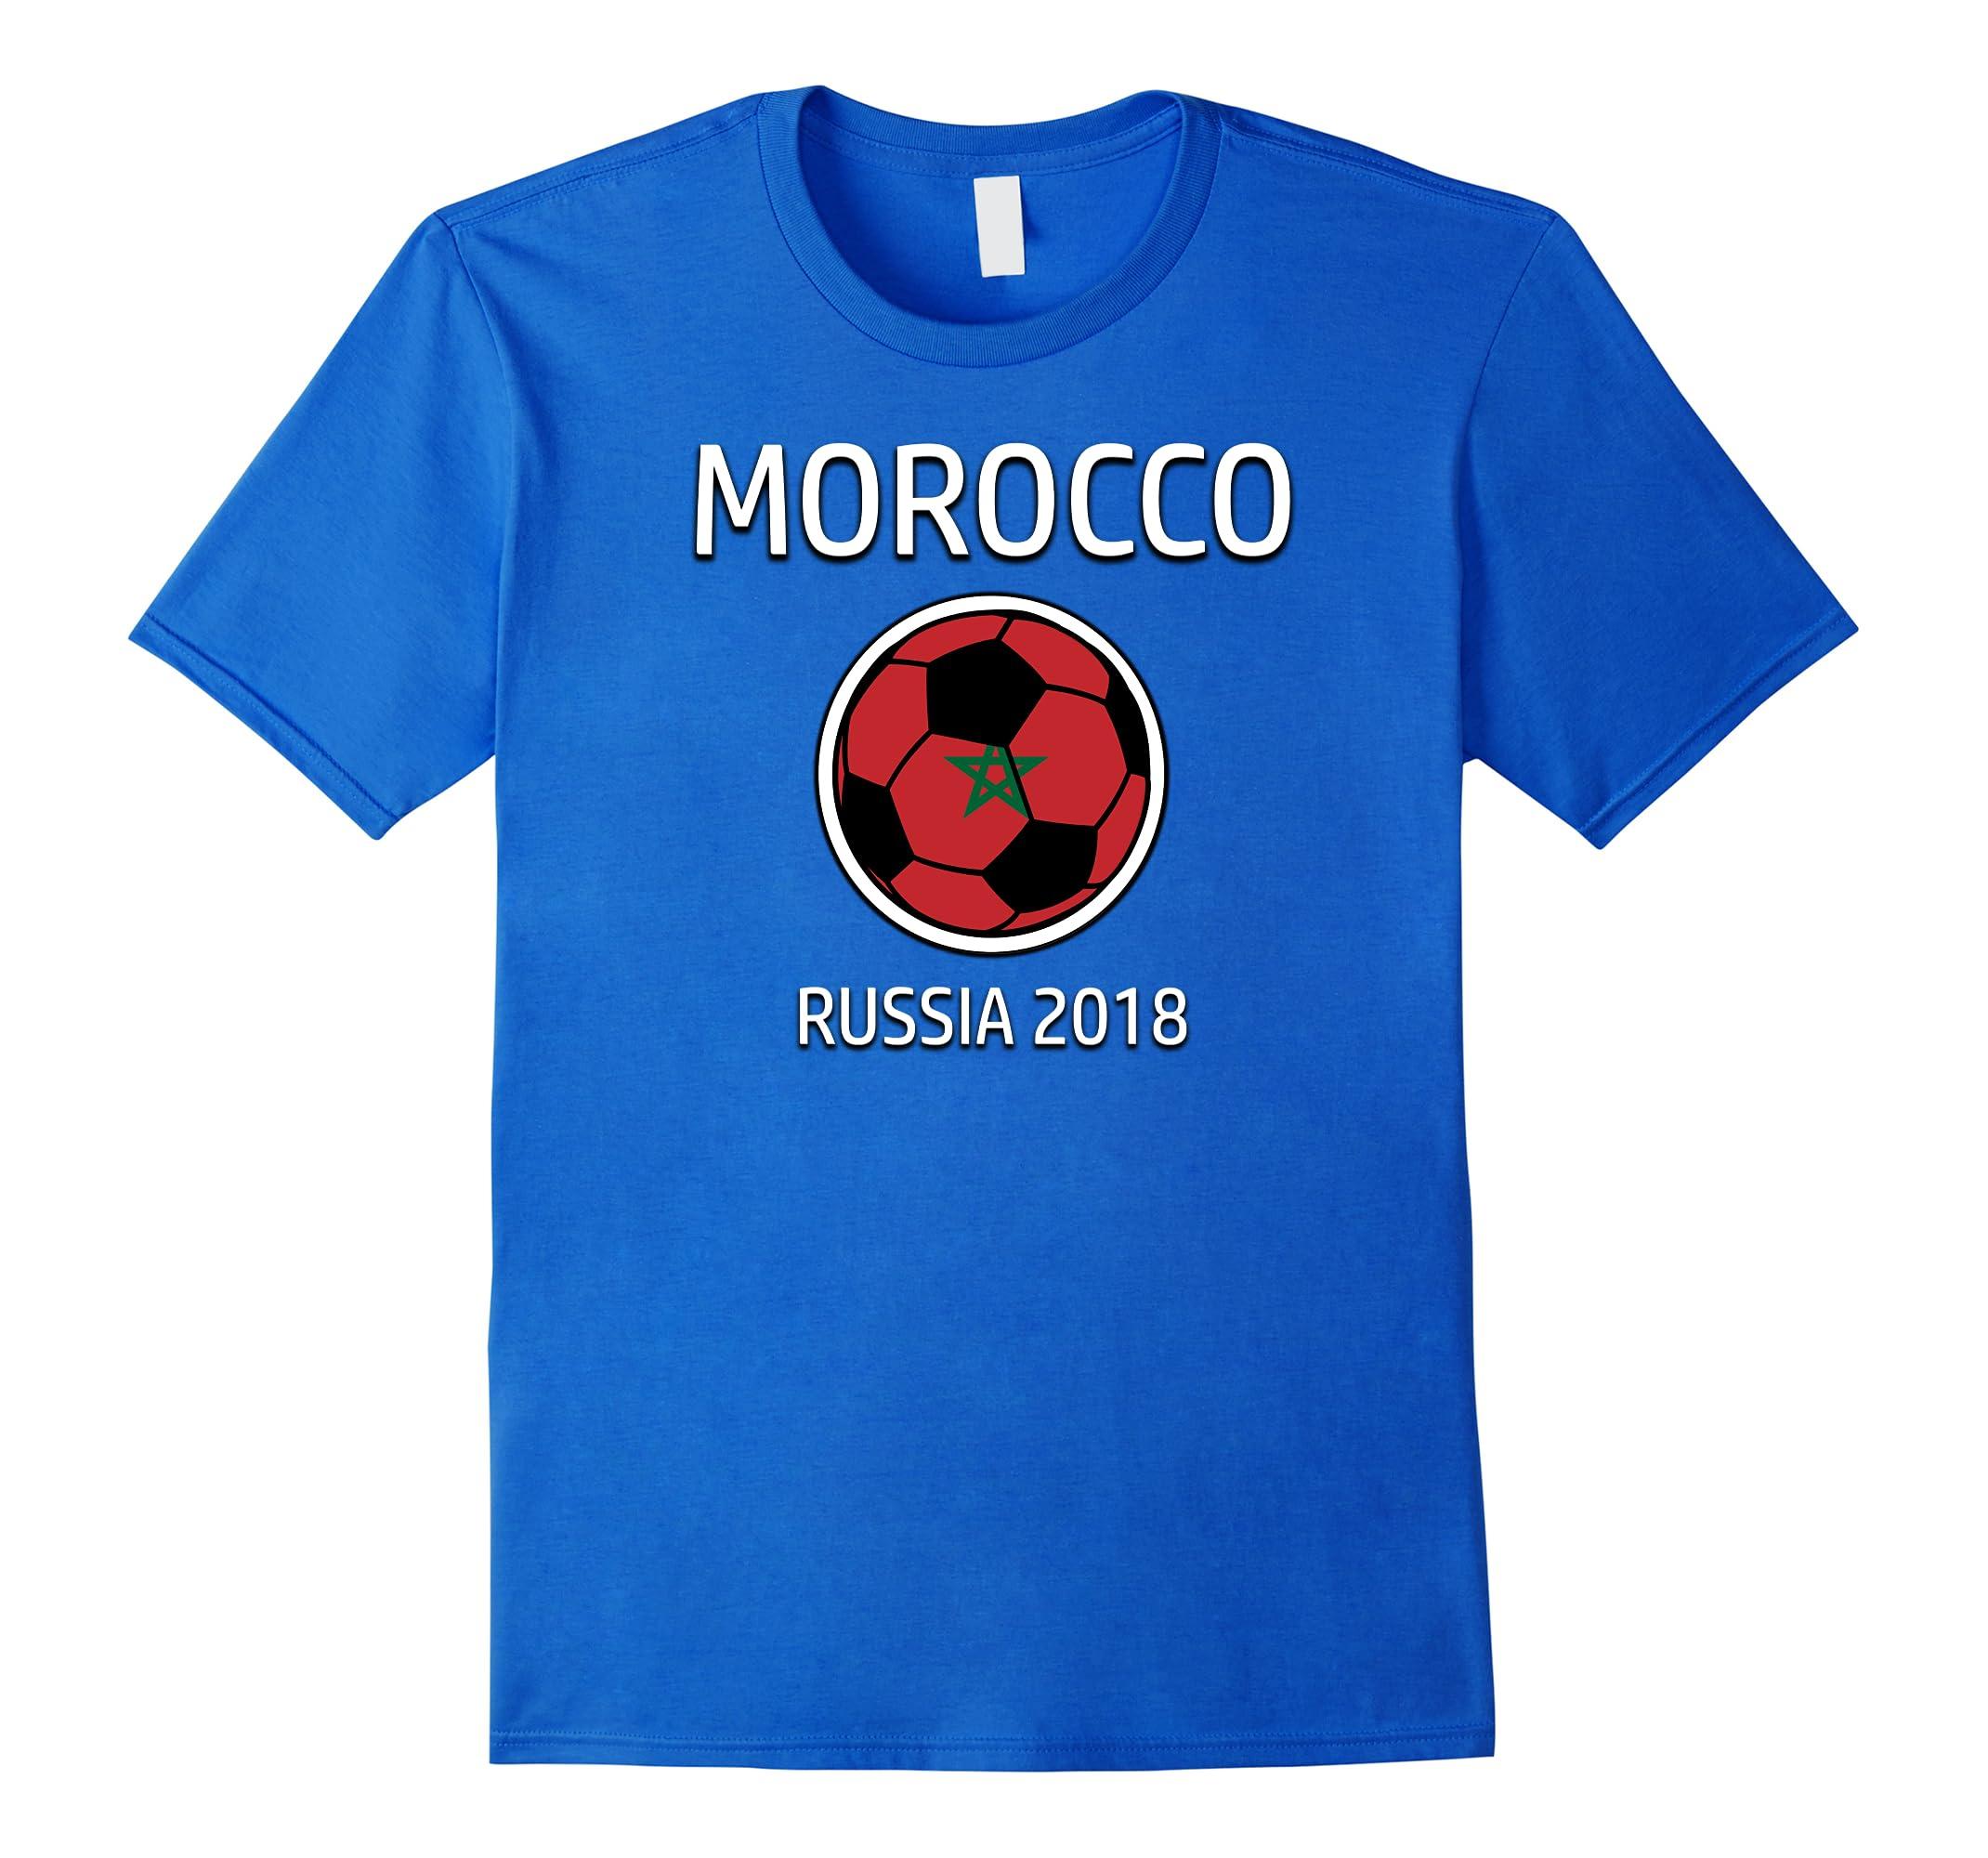 Morocco Soccer Team Russia 2018 T Shirt Football Fan-RT